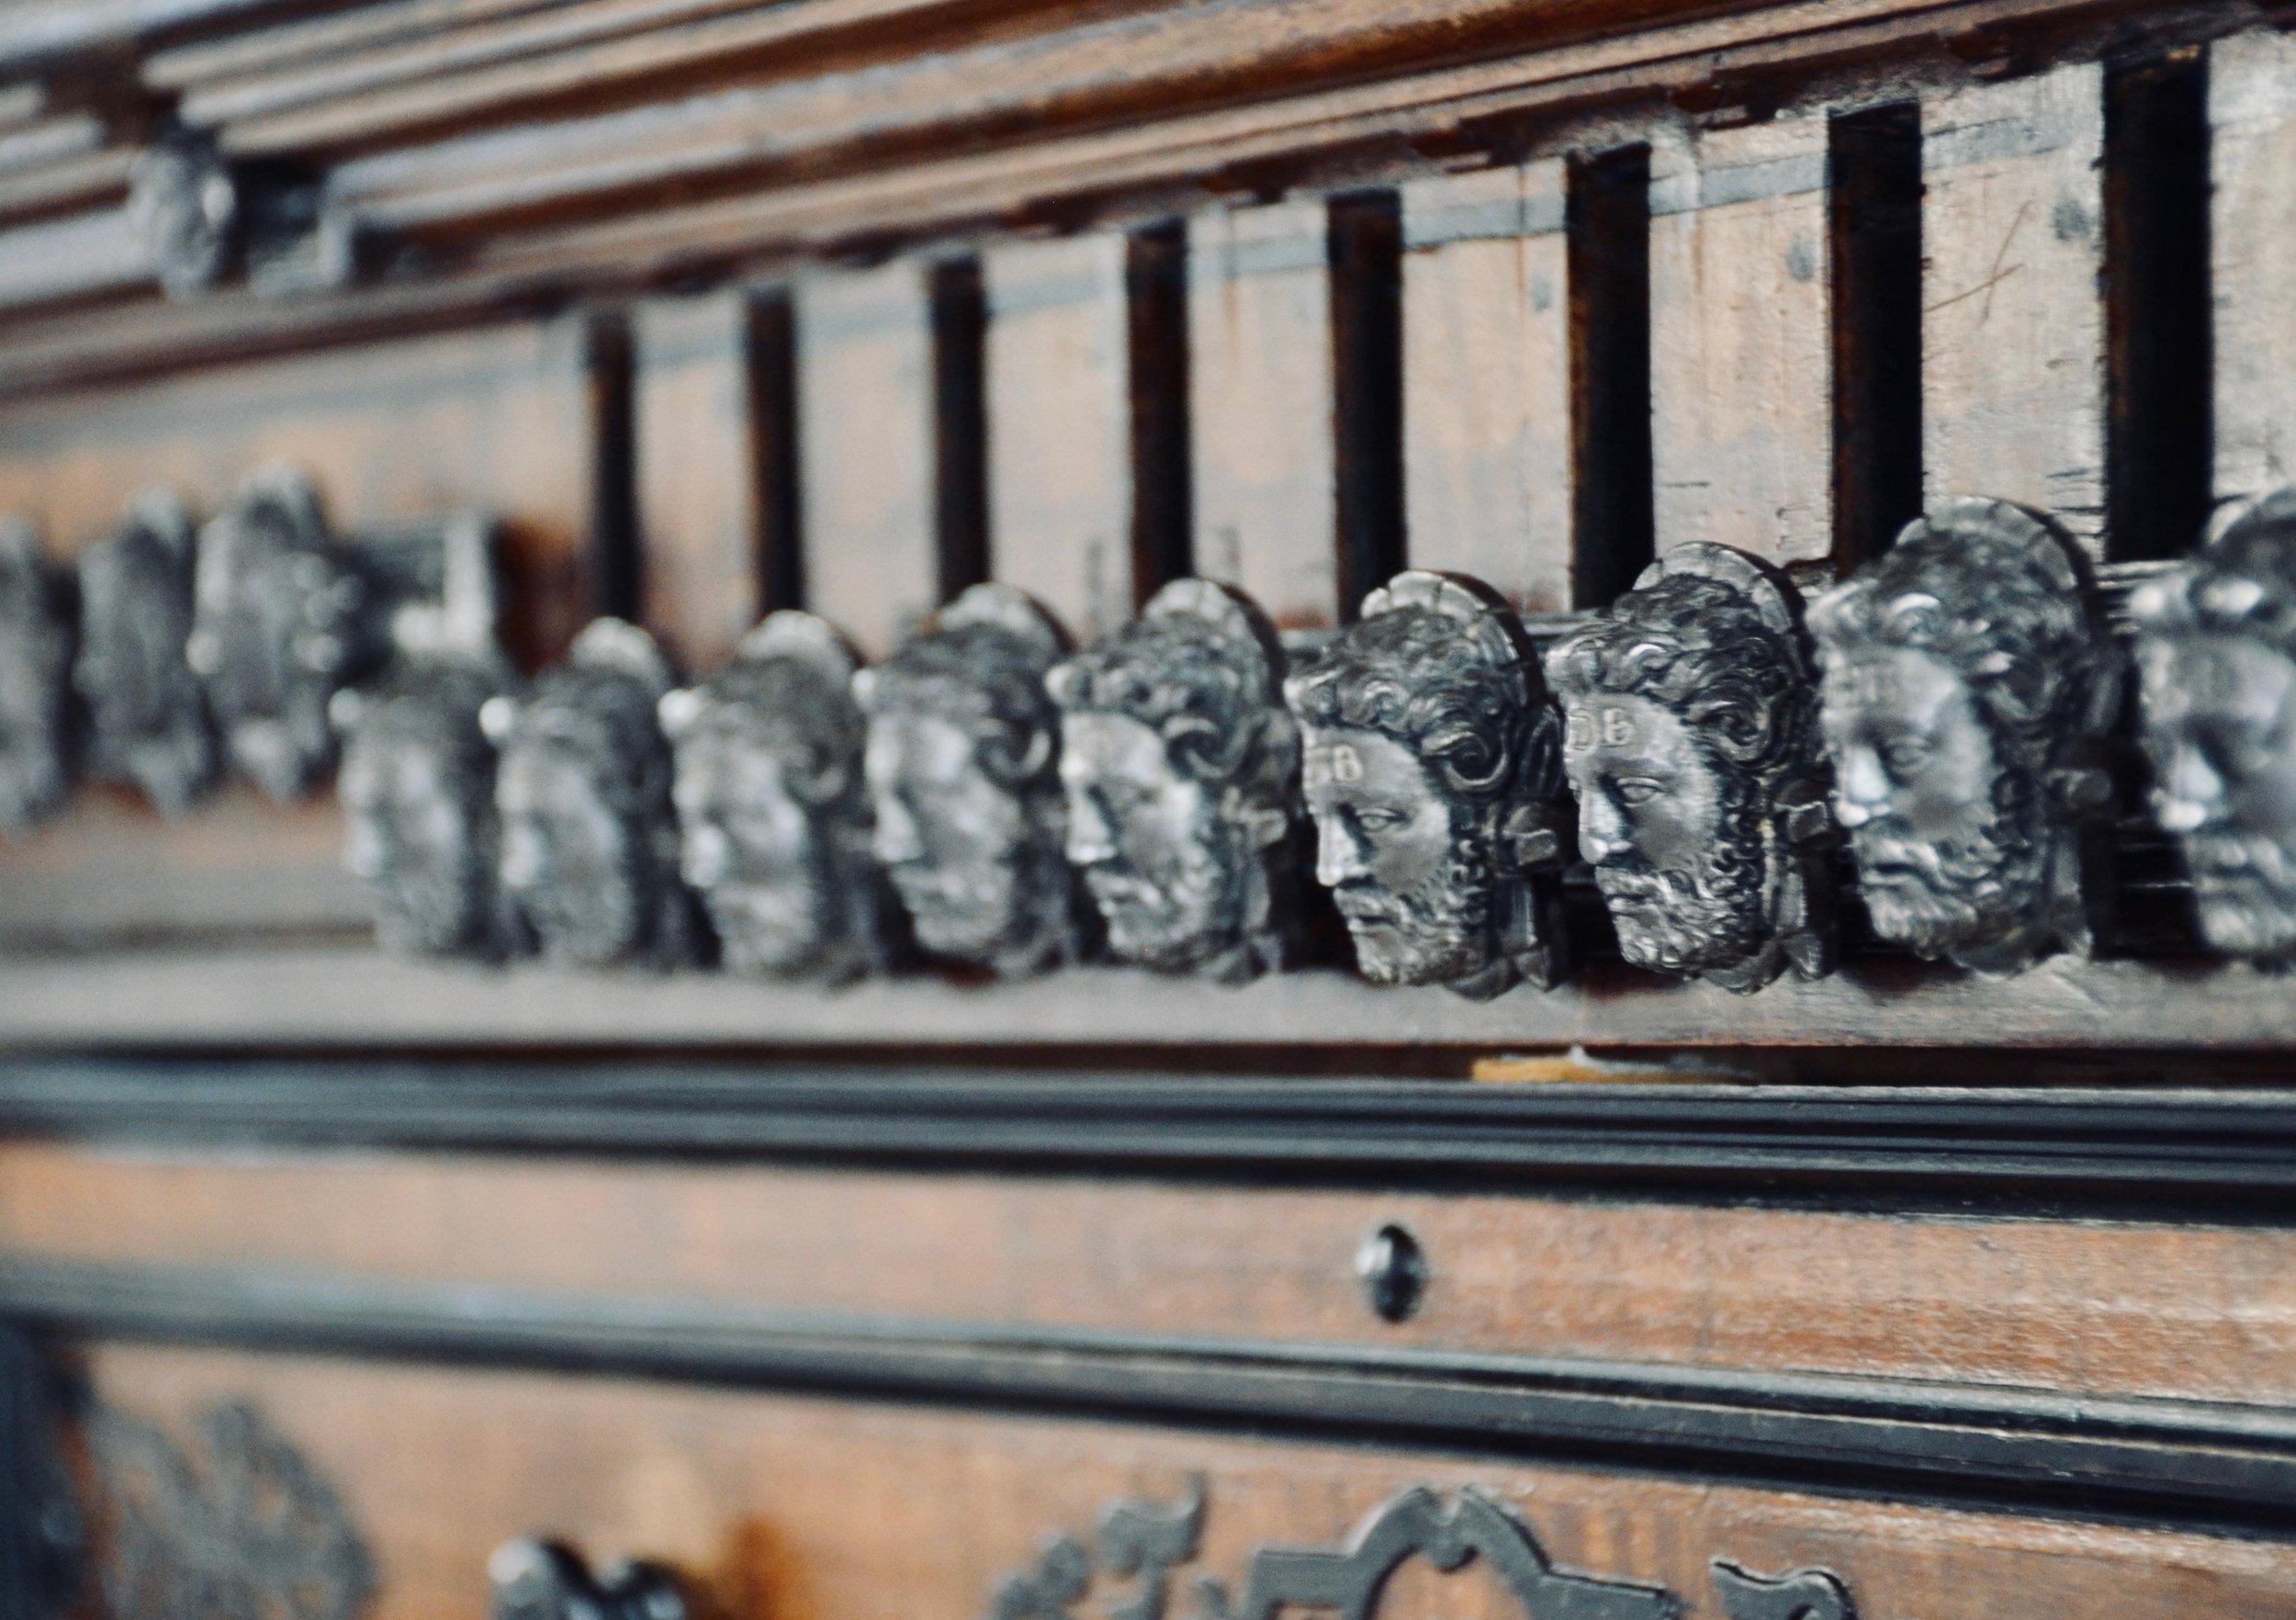 Stopknob detail, 1610 Compenius organ, Frederiksborg Castle, Hillerød, Denmark.